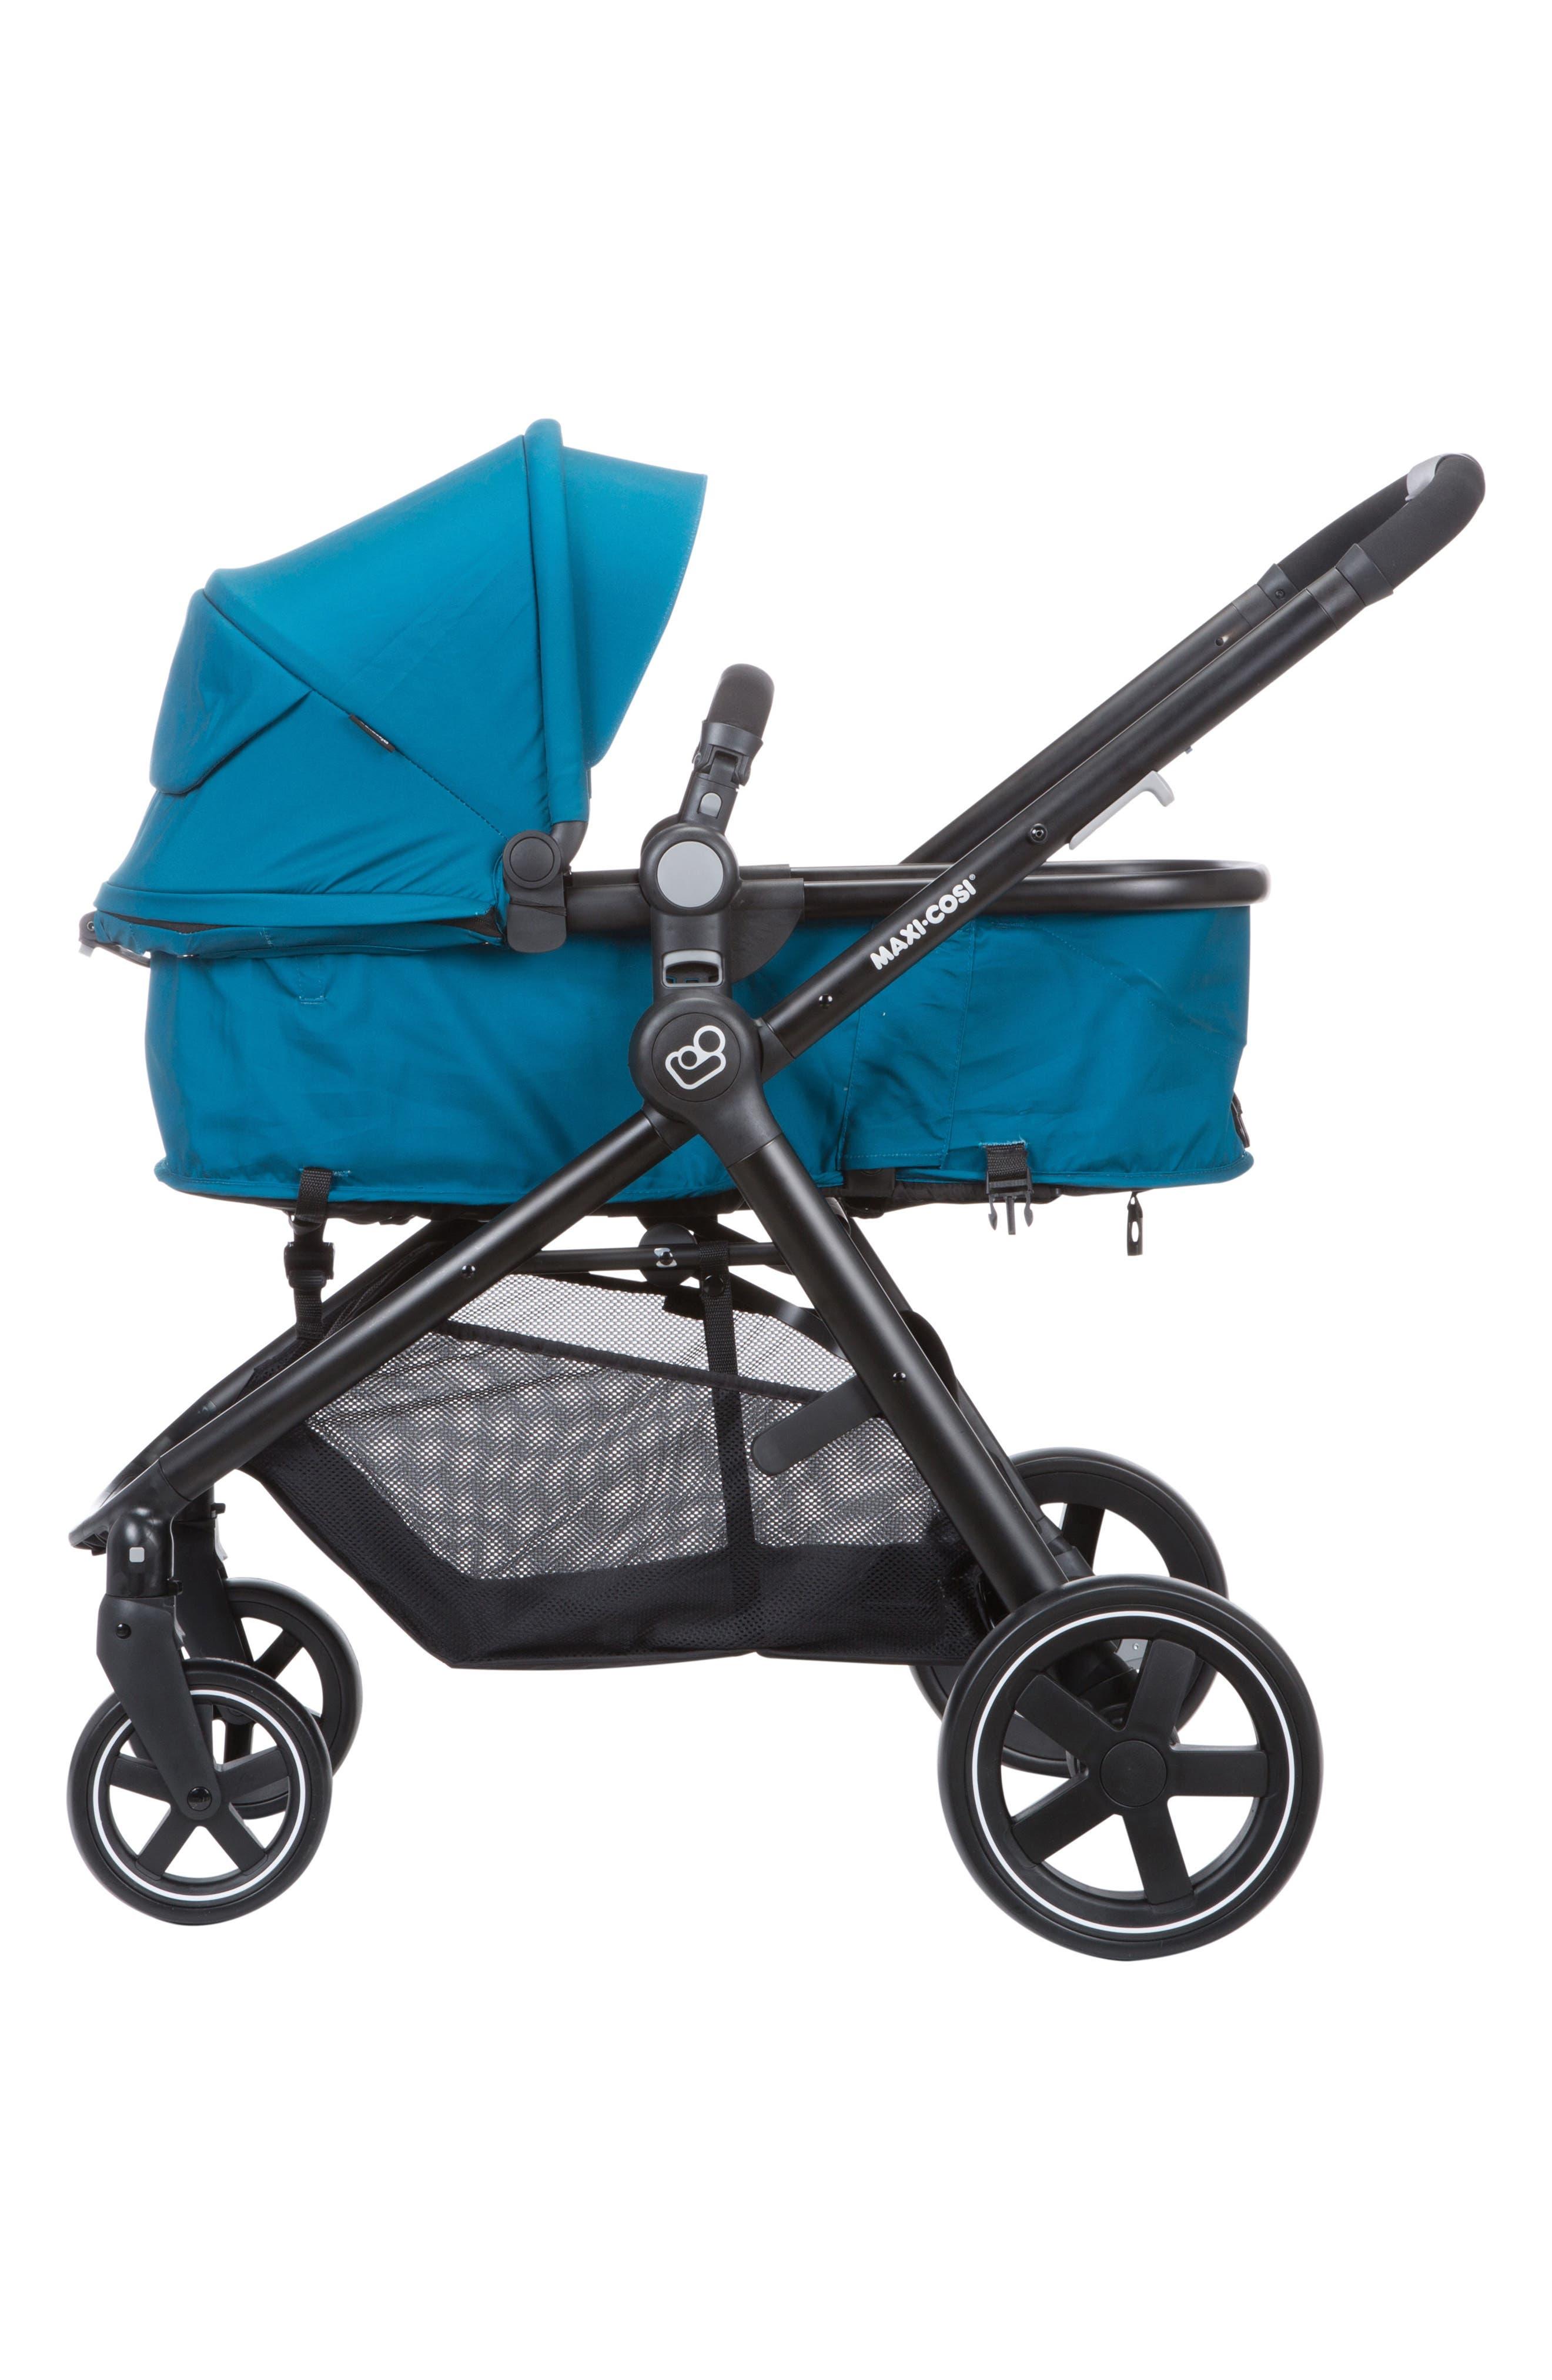 5-1 Mico 30 Infant Car Seat & Zelia Stroller Modular Travel System,                             Alternate thumbnail 10, color,                             EMERALD TIDE